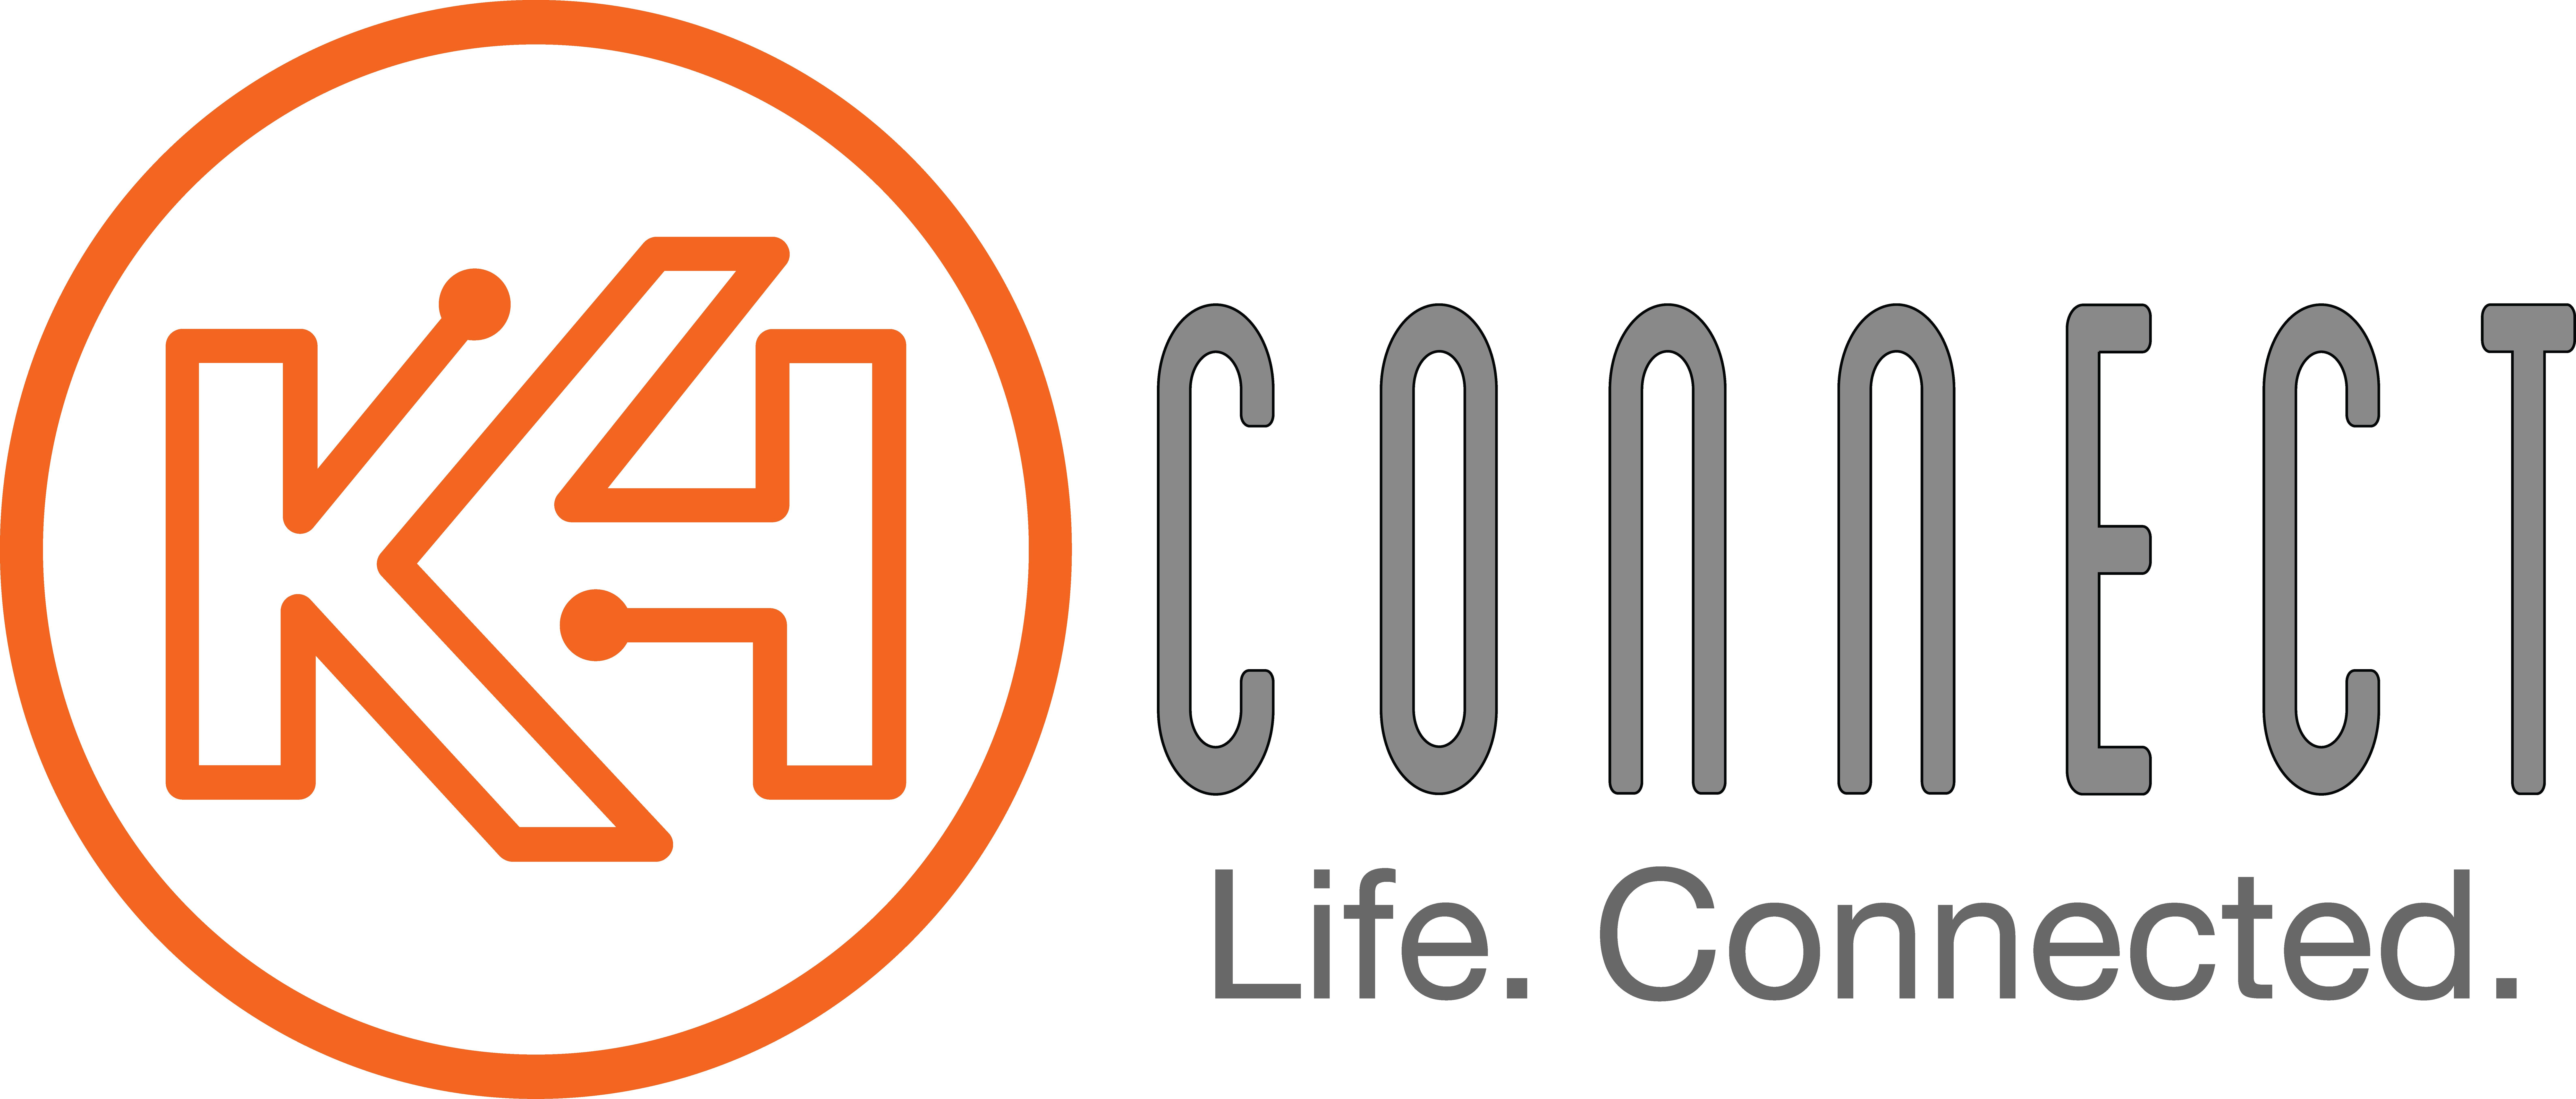 k4_connect_tagline